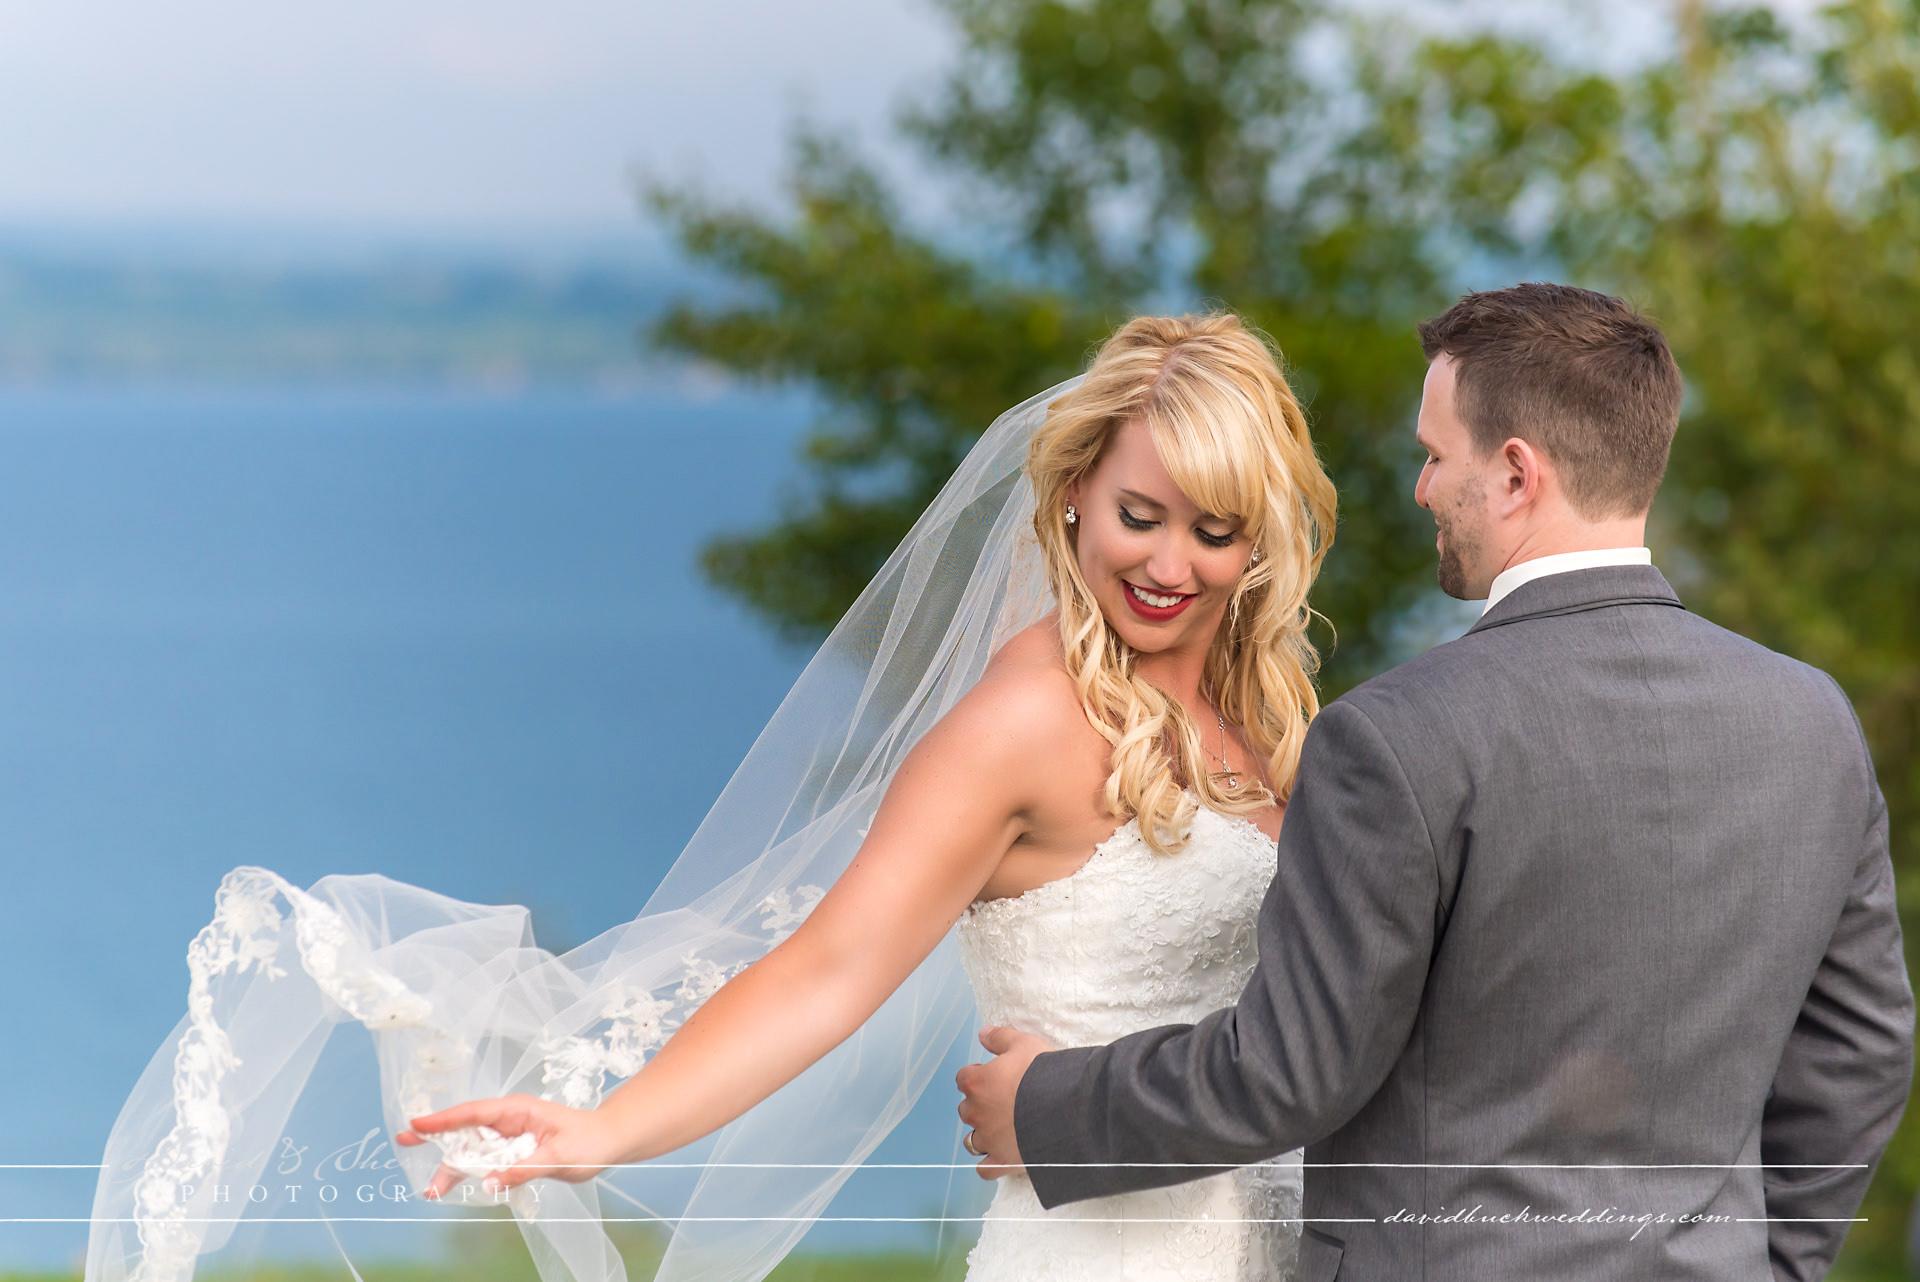 Cobble_Beach_Wedding_Photography_025